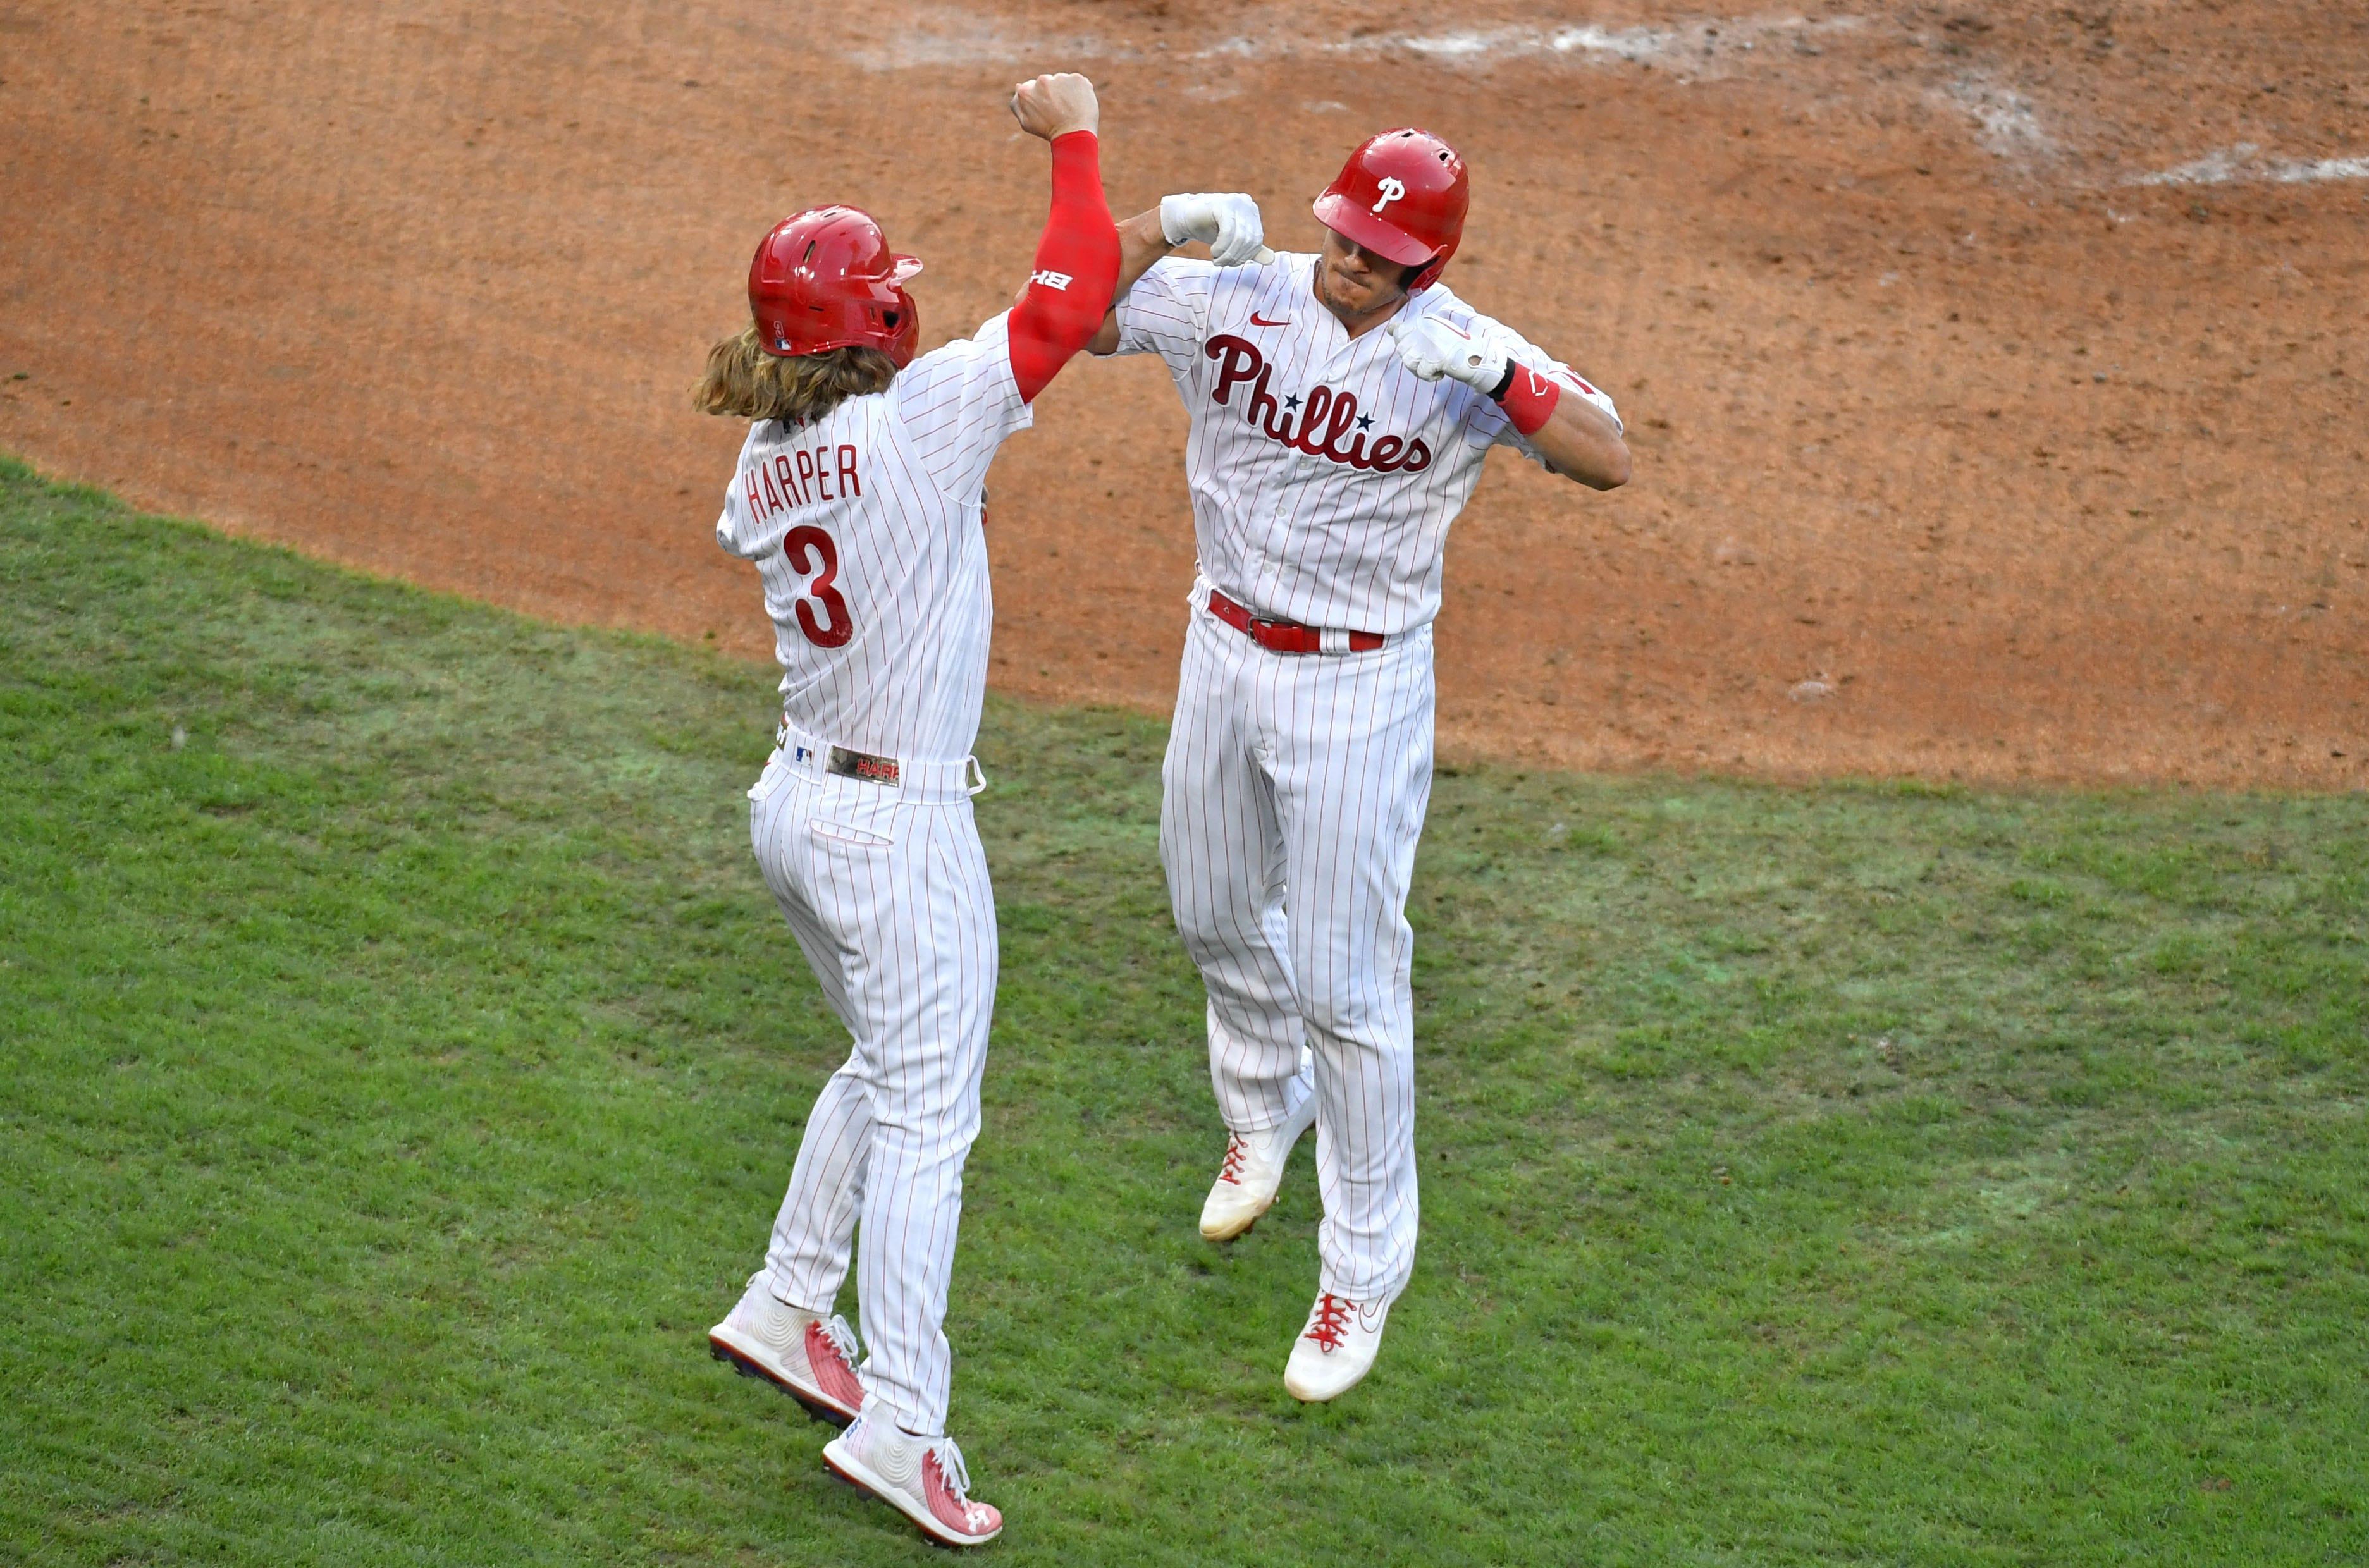 Bryce Harper Phillies New Arrivals Baseball Player Fade Jersey